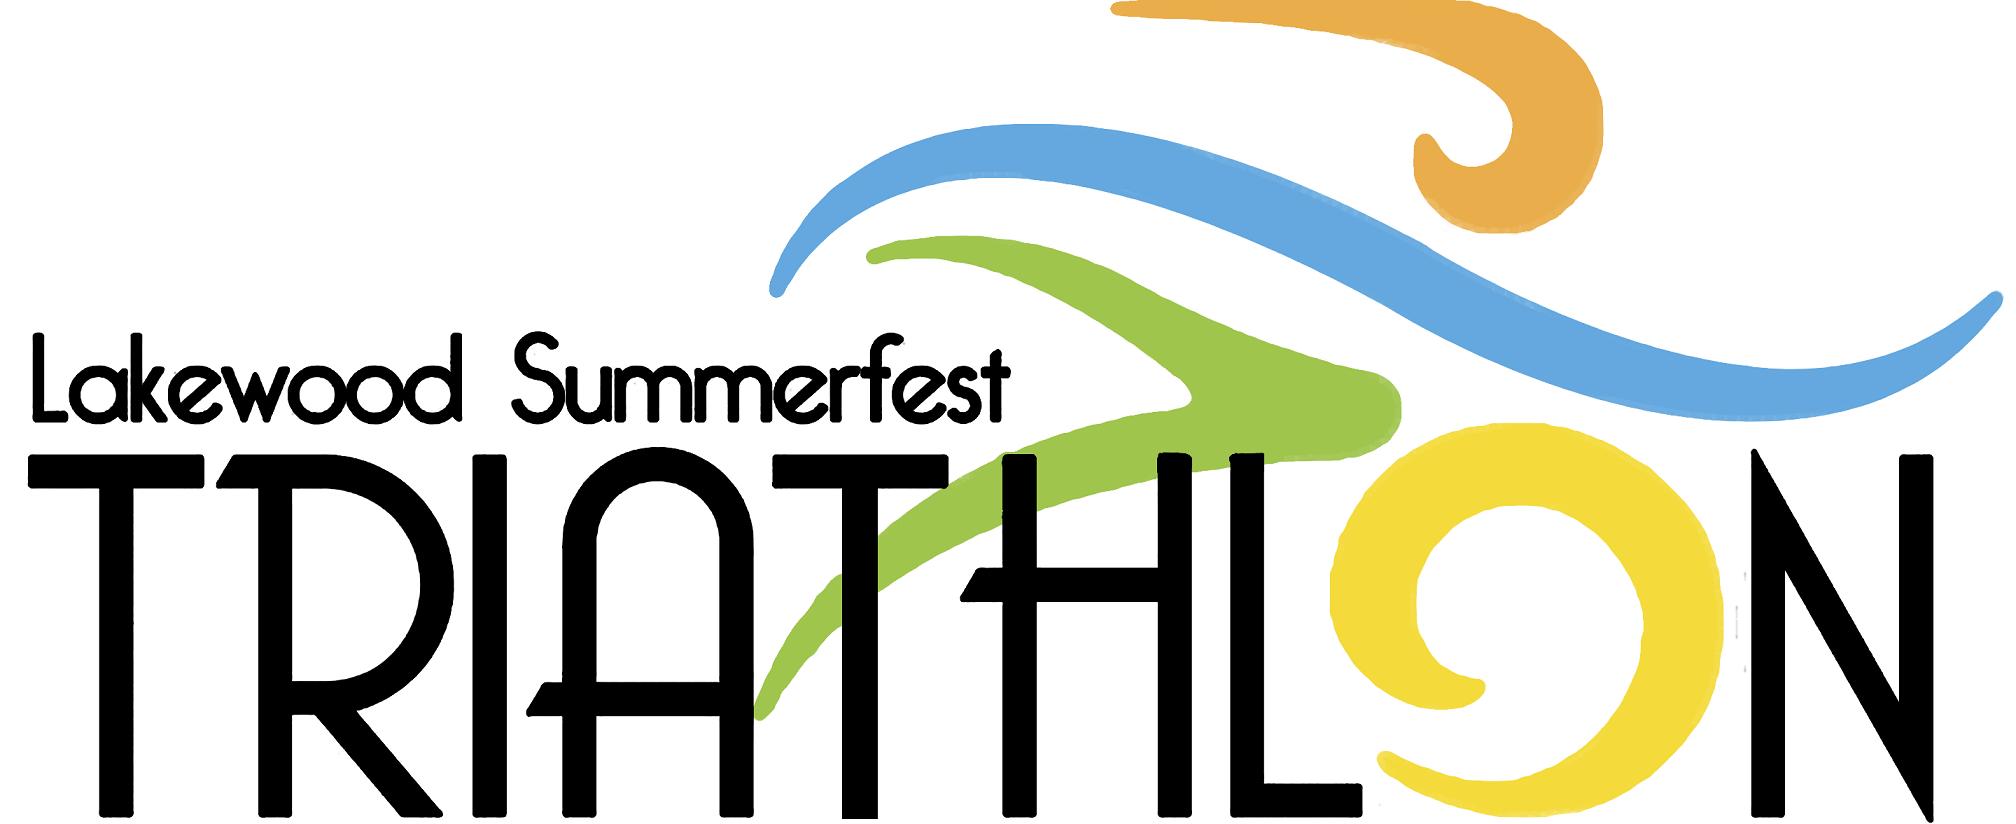 SummerFEST Triathlon – City of Lakewood